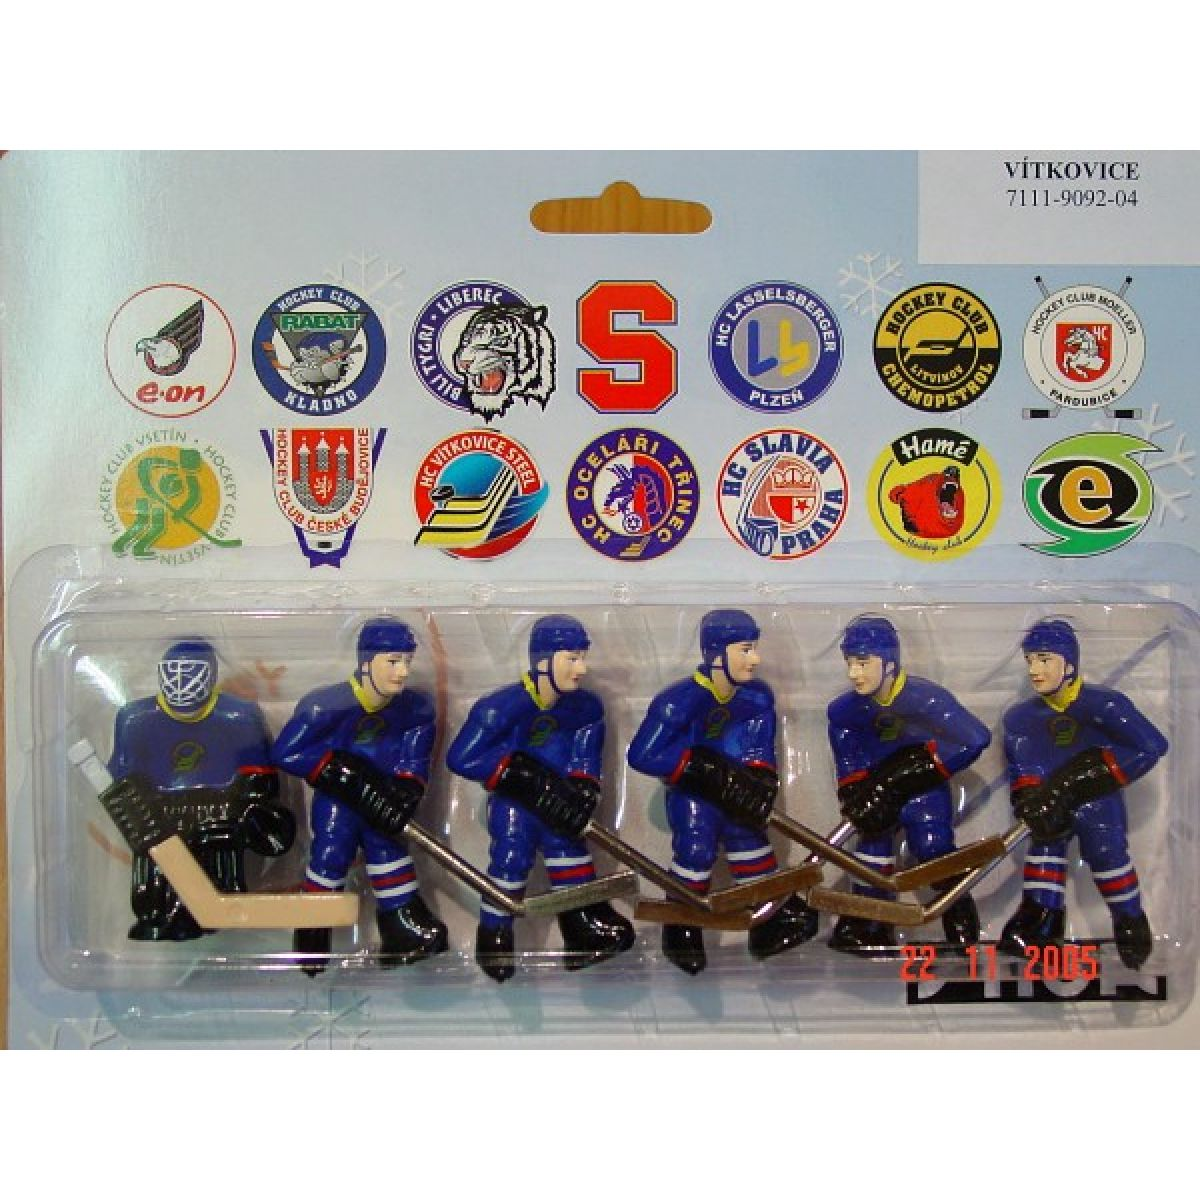 Stiga Hokejový tým - Vítkovice